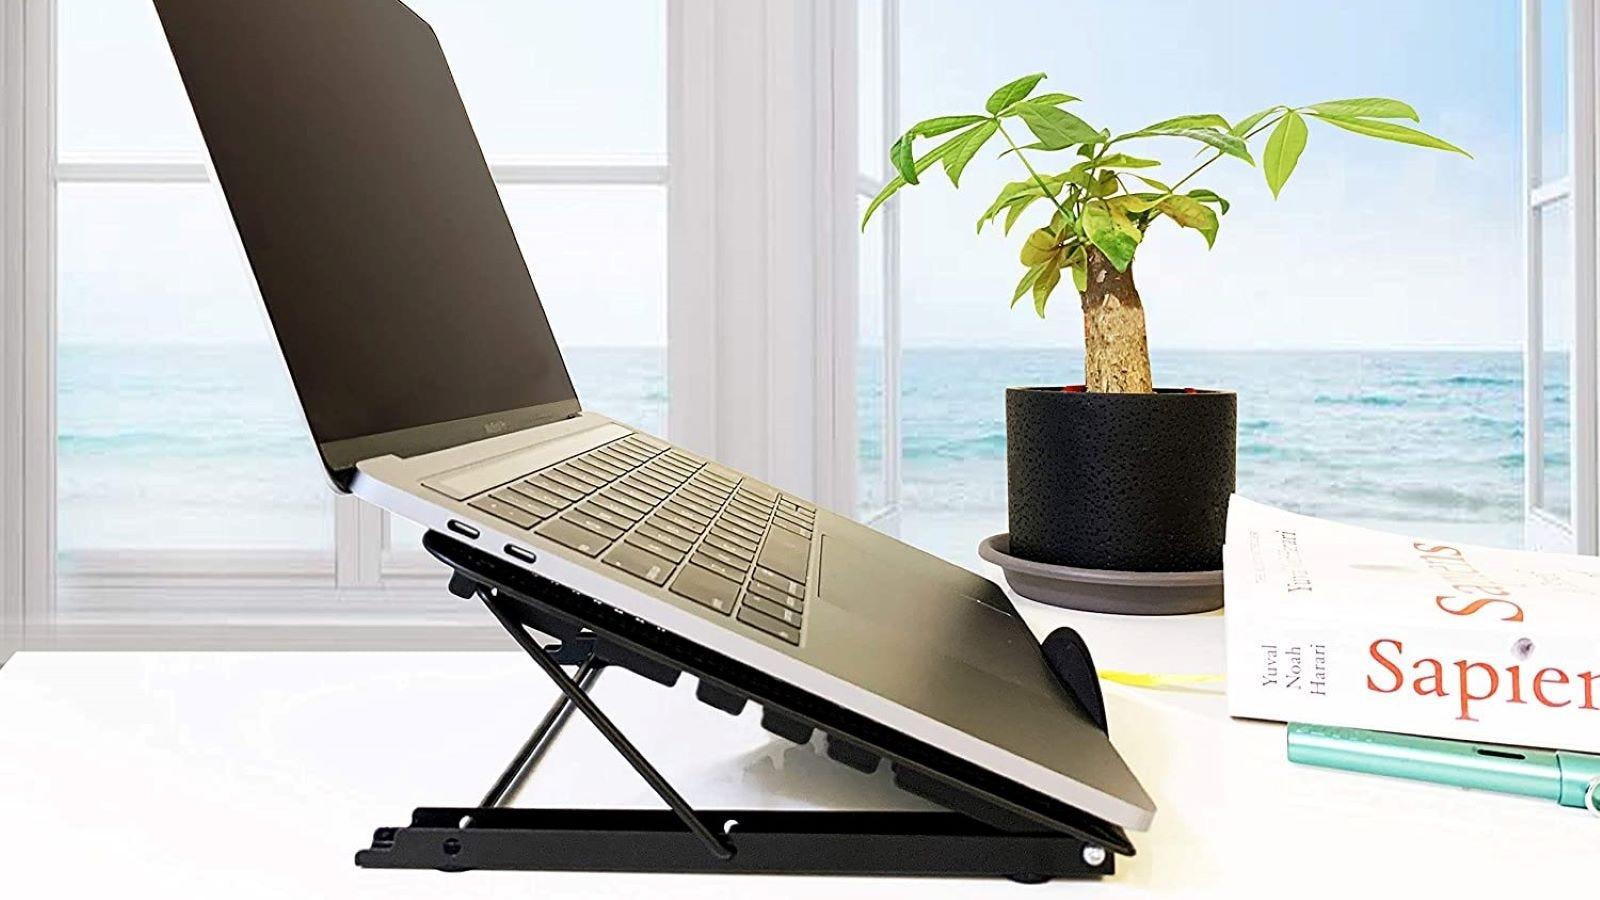 Awezon Adjustable Ventilated Laptop Stand.